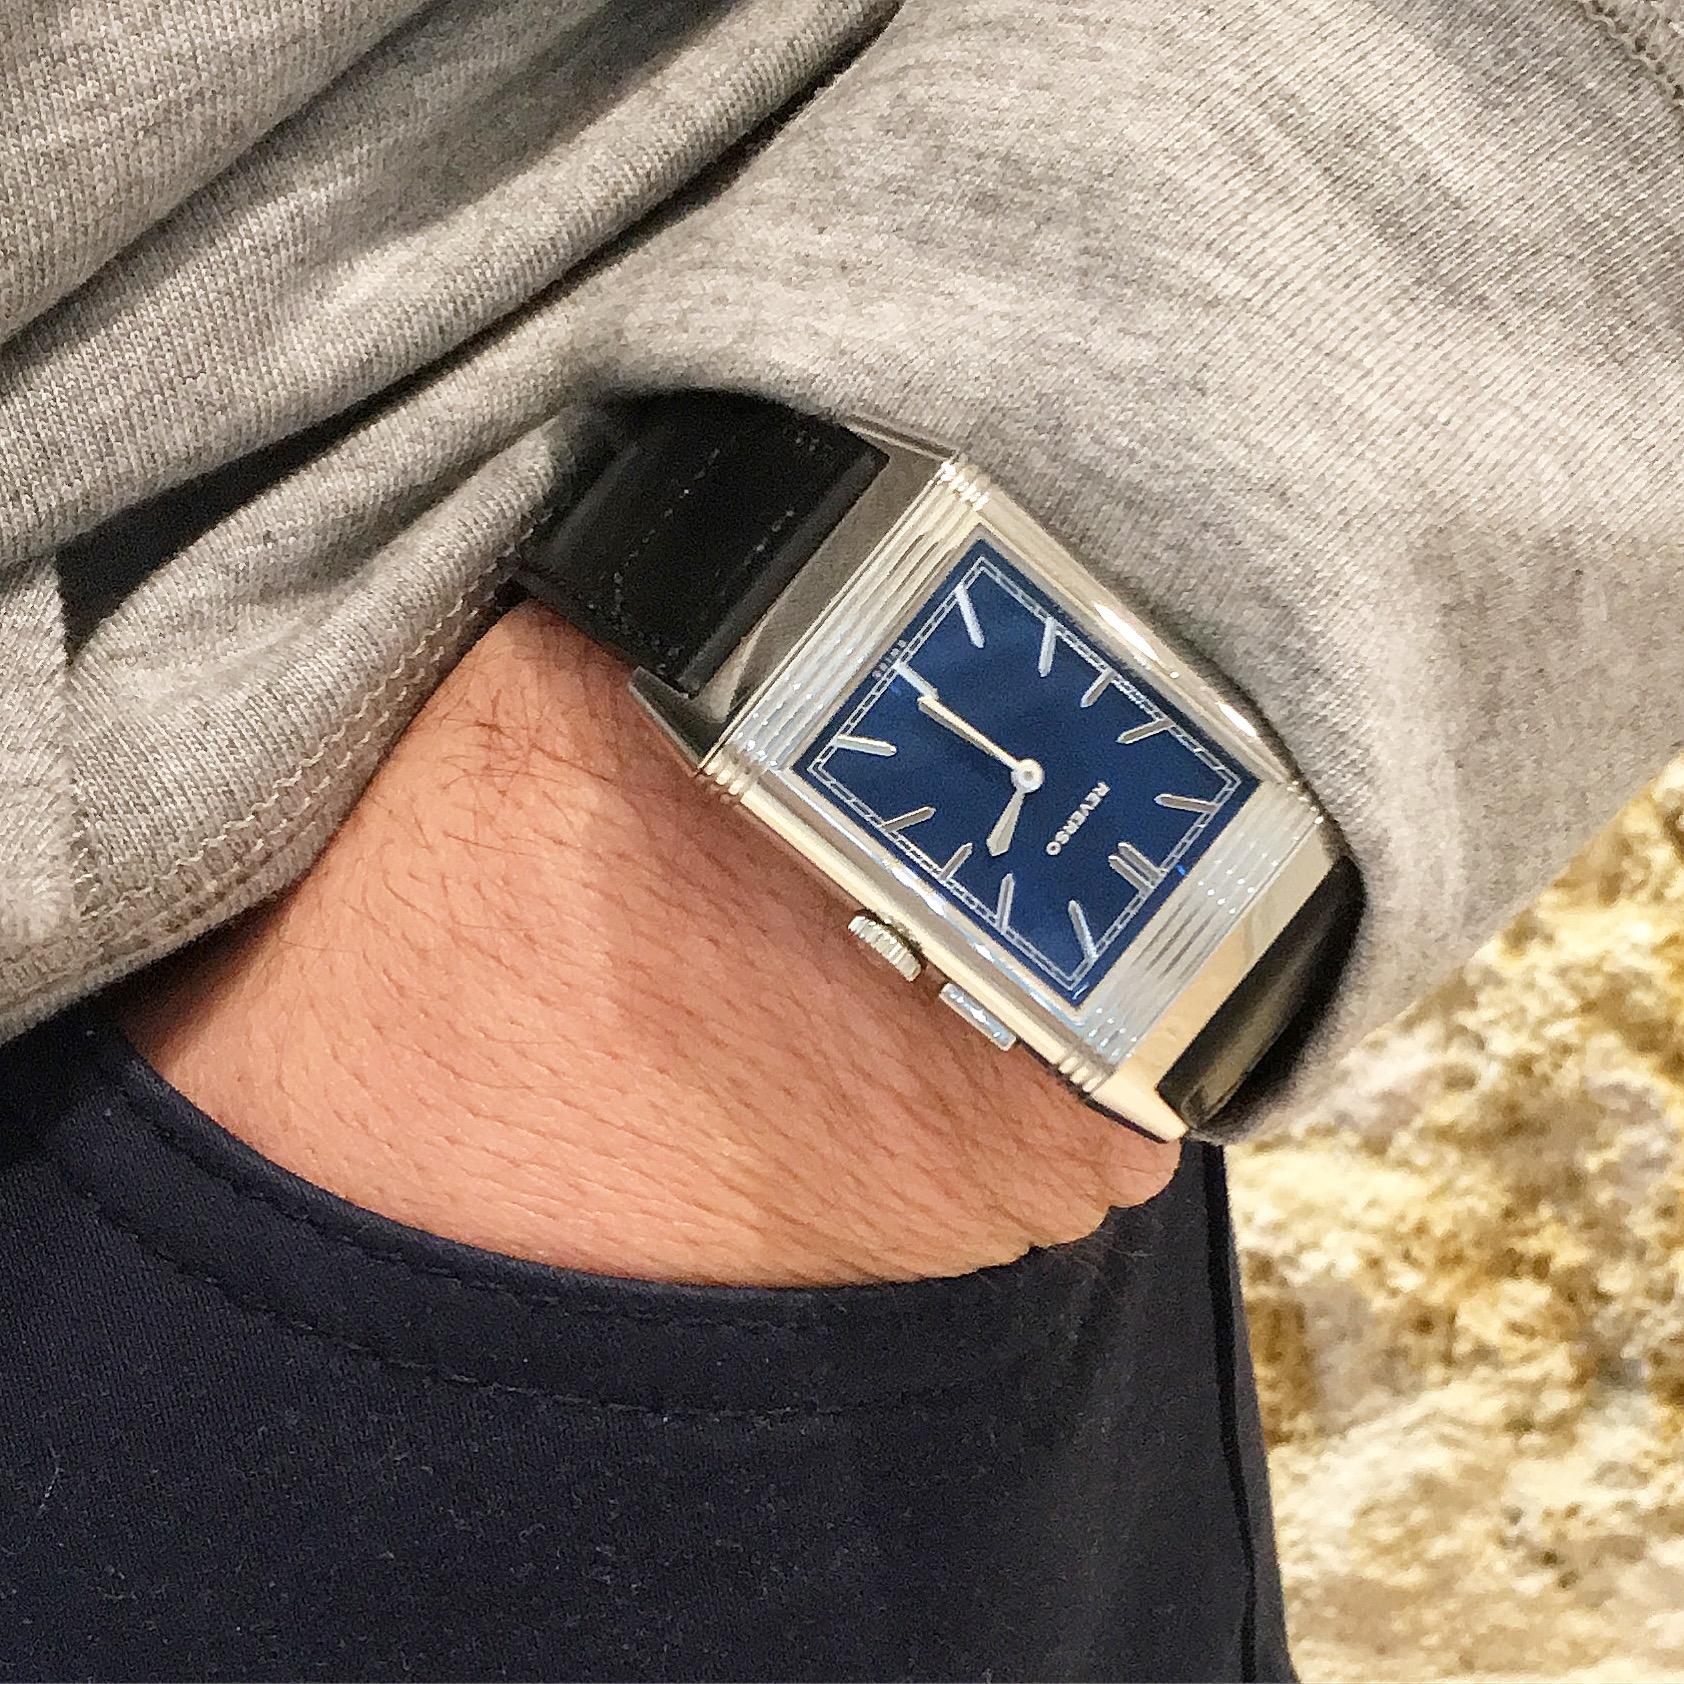 Montre occasion Jaeger LeCoultre Grande Reverso Ultra Thin Duoface Bleu.